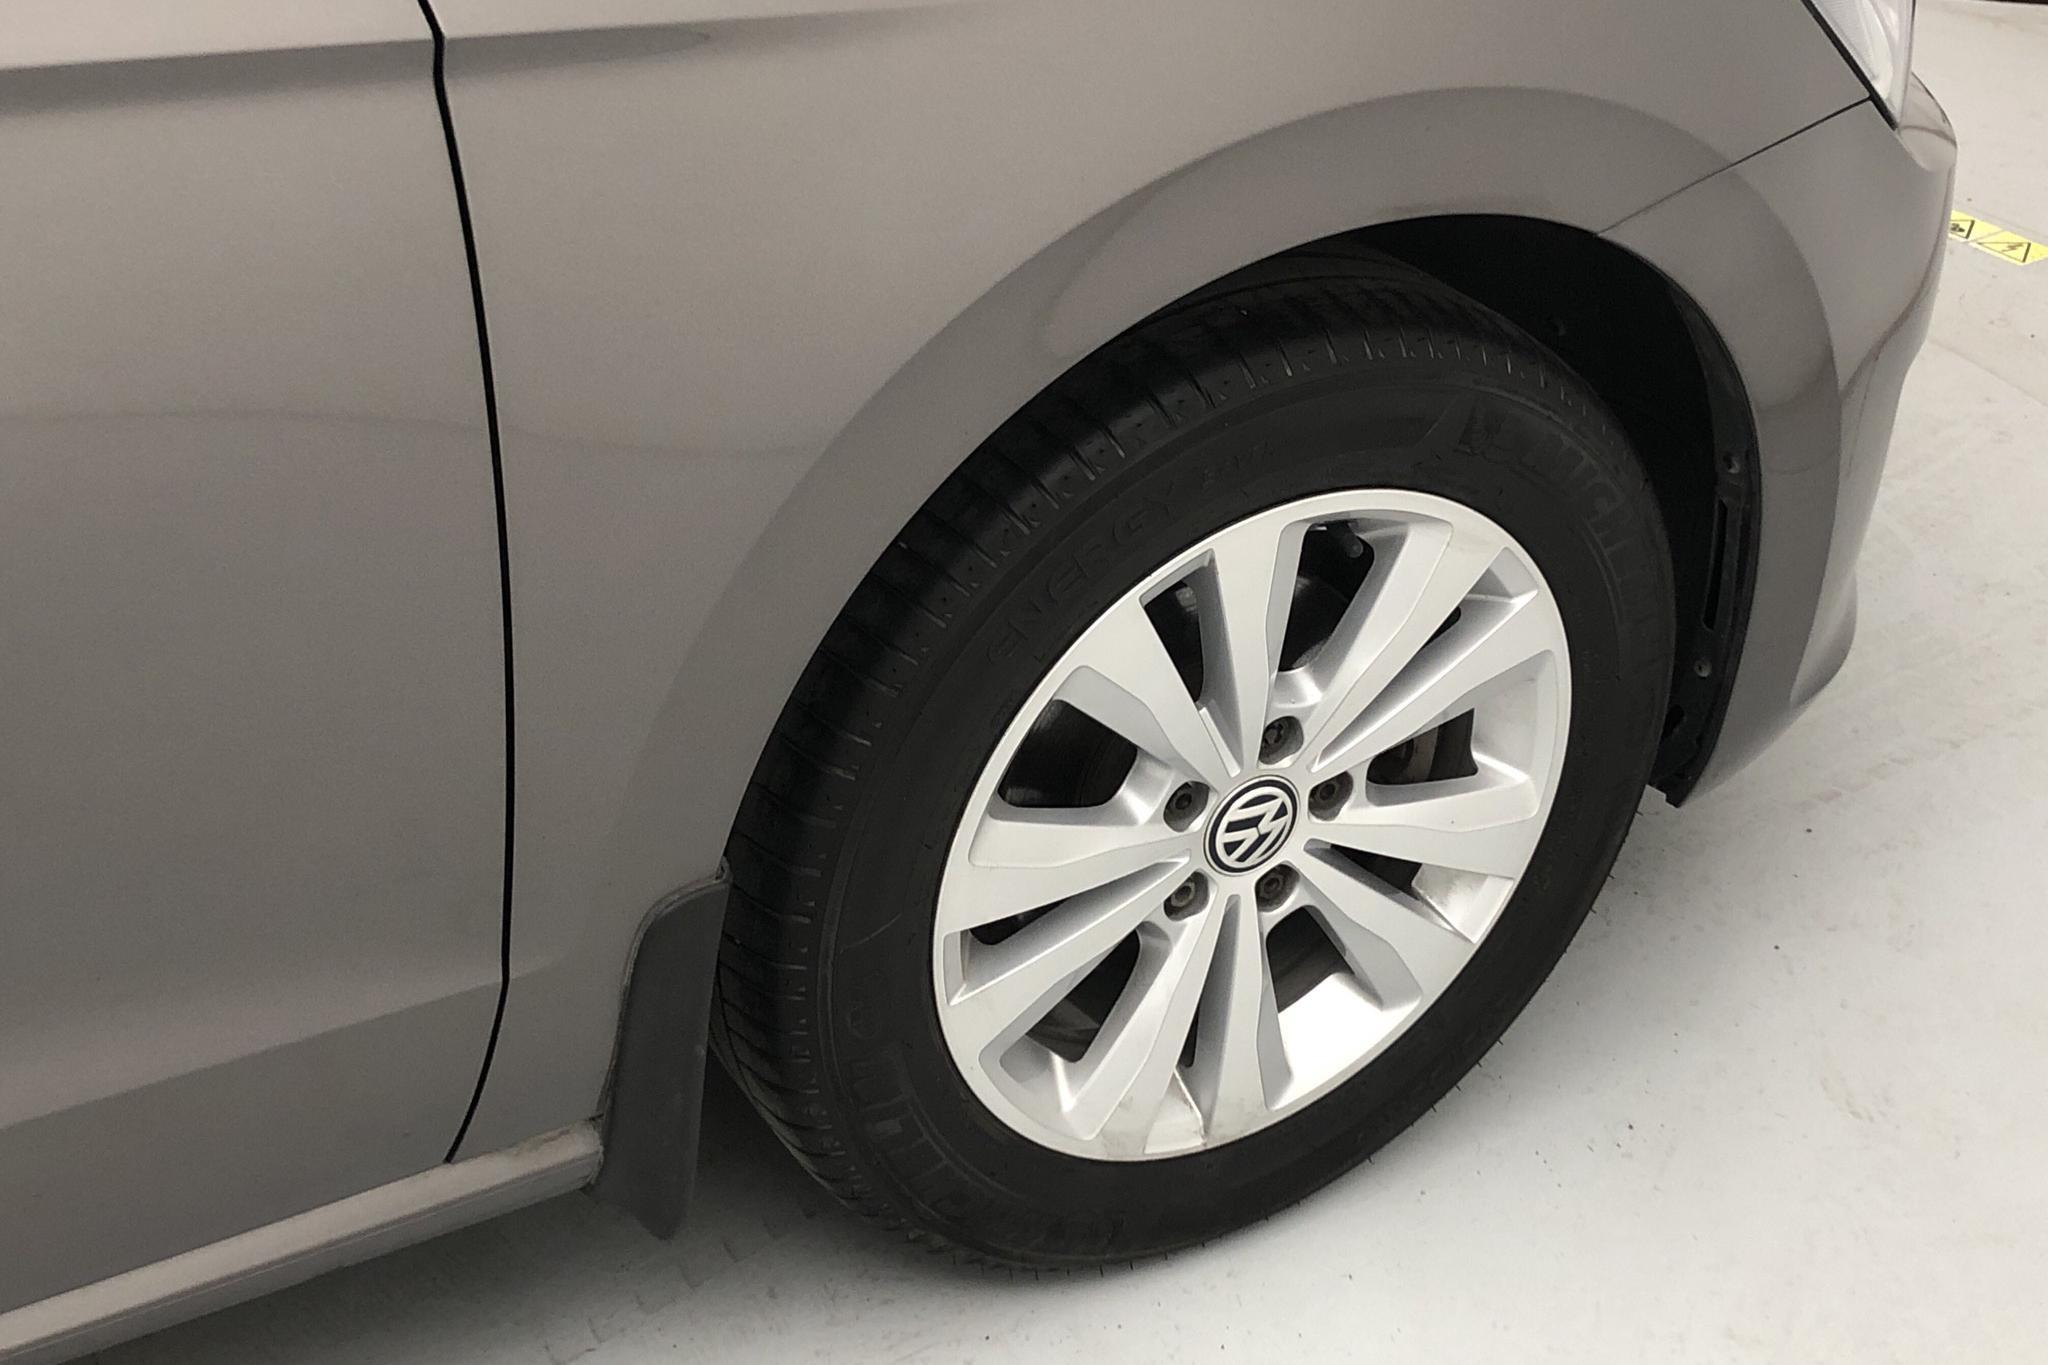 VW Golf VII 1.2 TSI BlueMotion Technology Sportsvan (110hk) - 2 708 mil - Manuell - grå - 2017